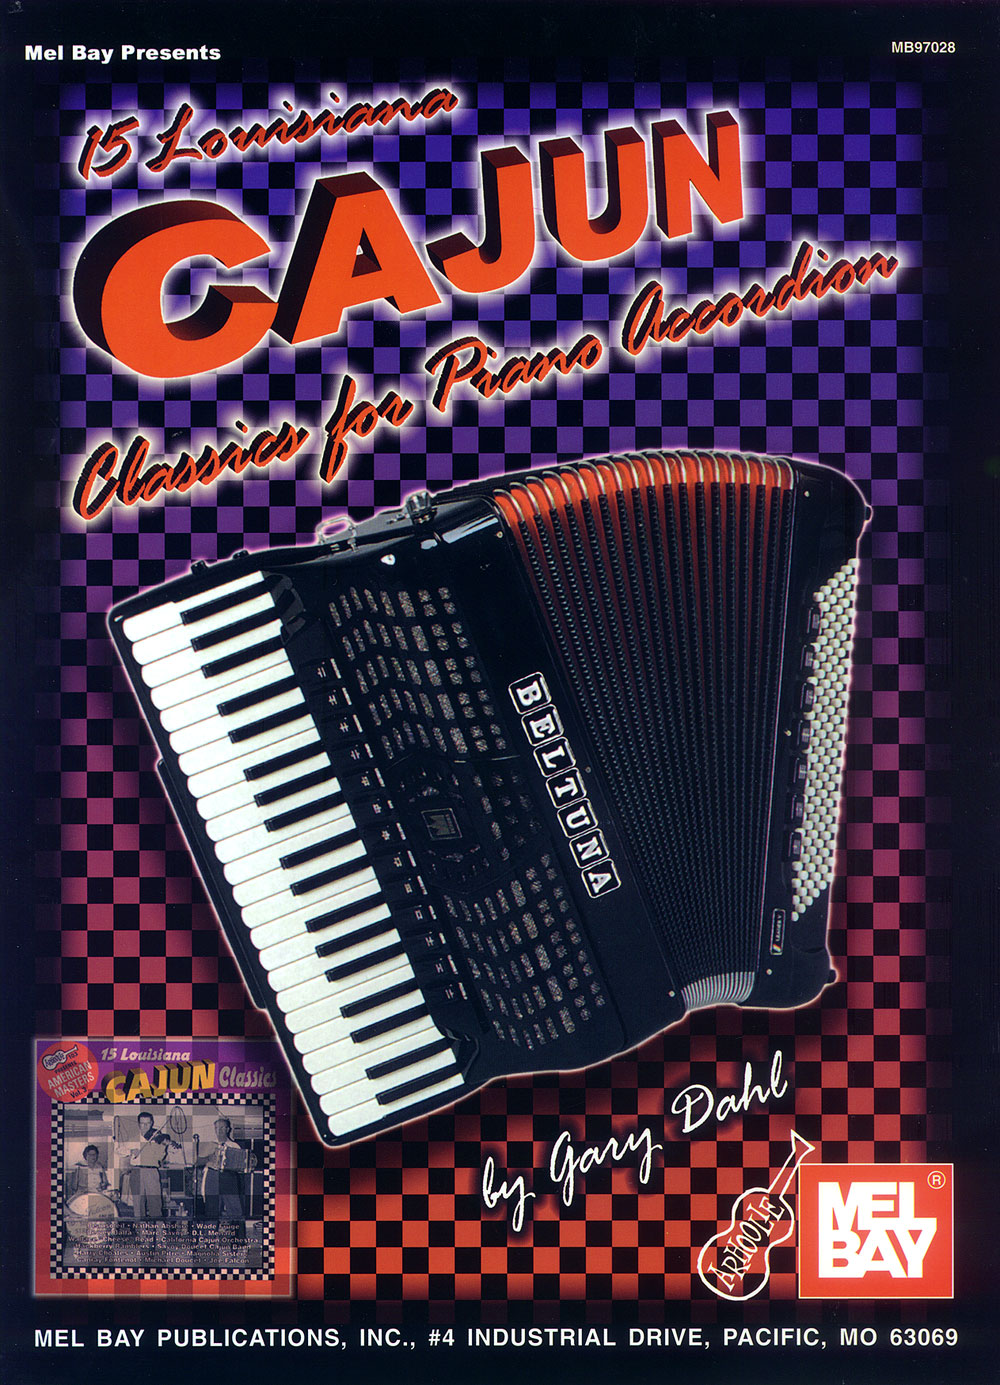 15 Louisiana Cajun Classics for Accordion